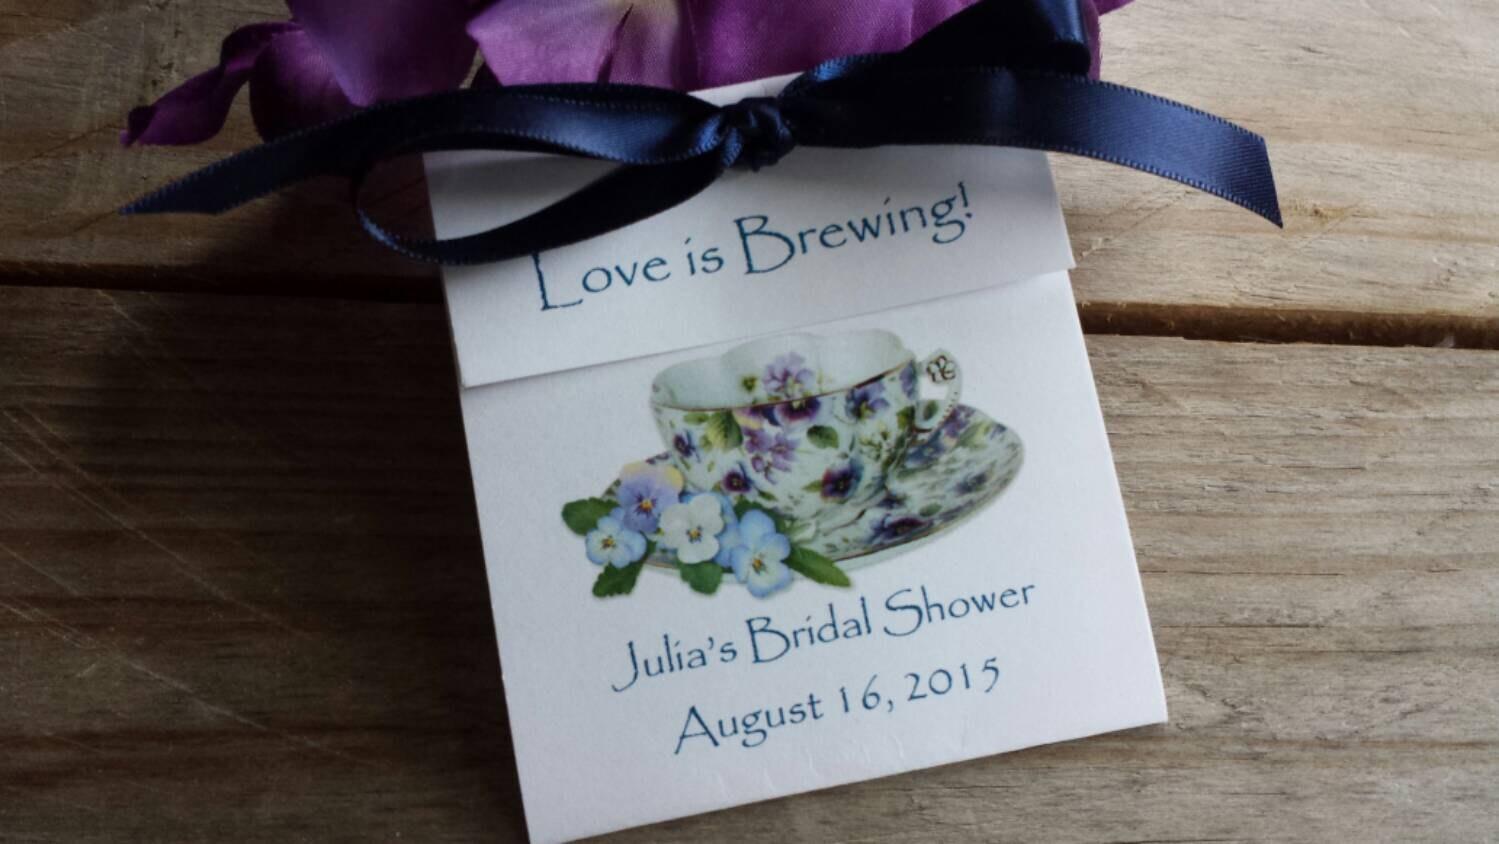 Viola Personalized Teacup Tea Bag Party Favors for Bridal